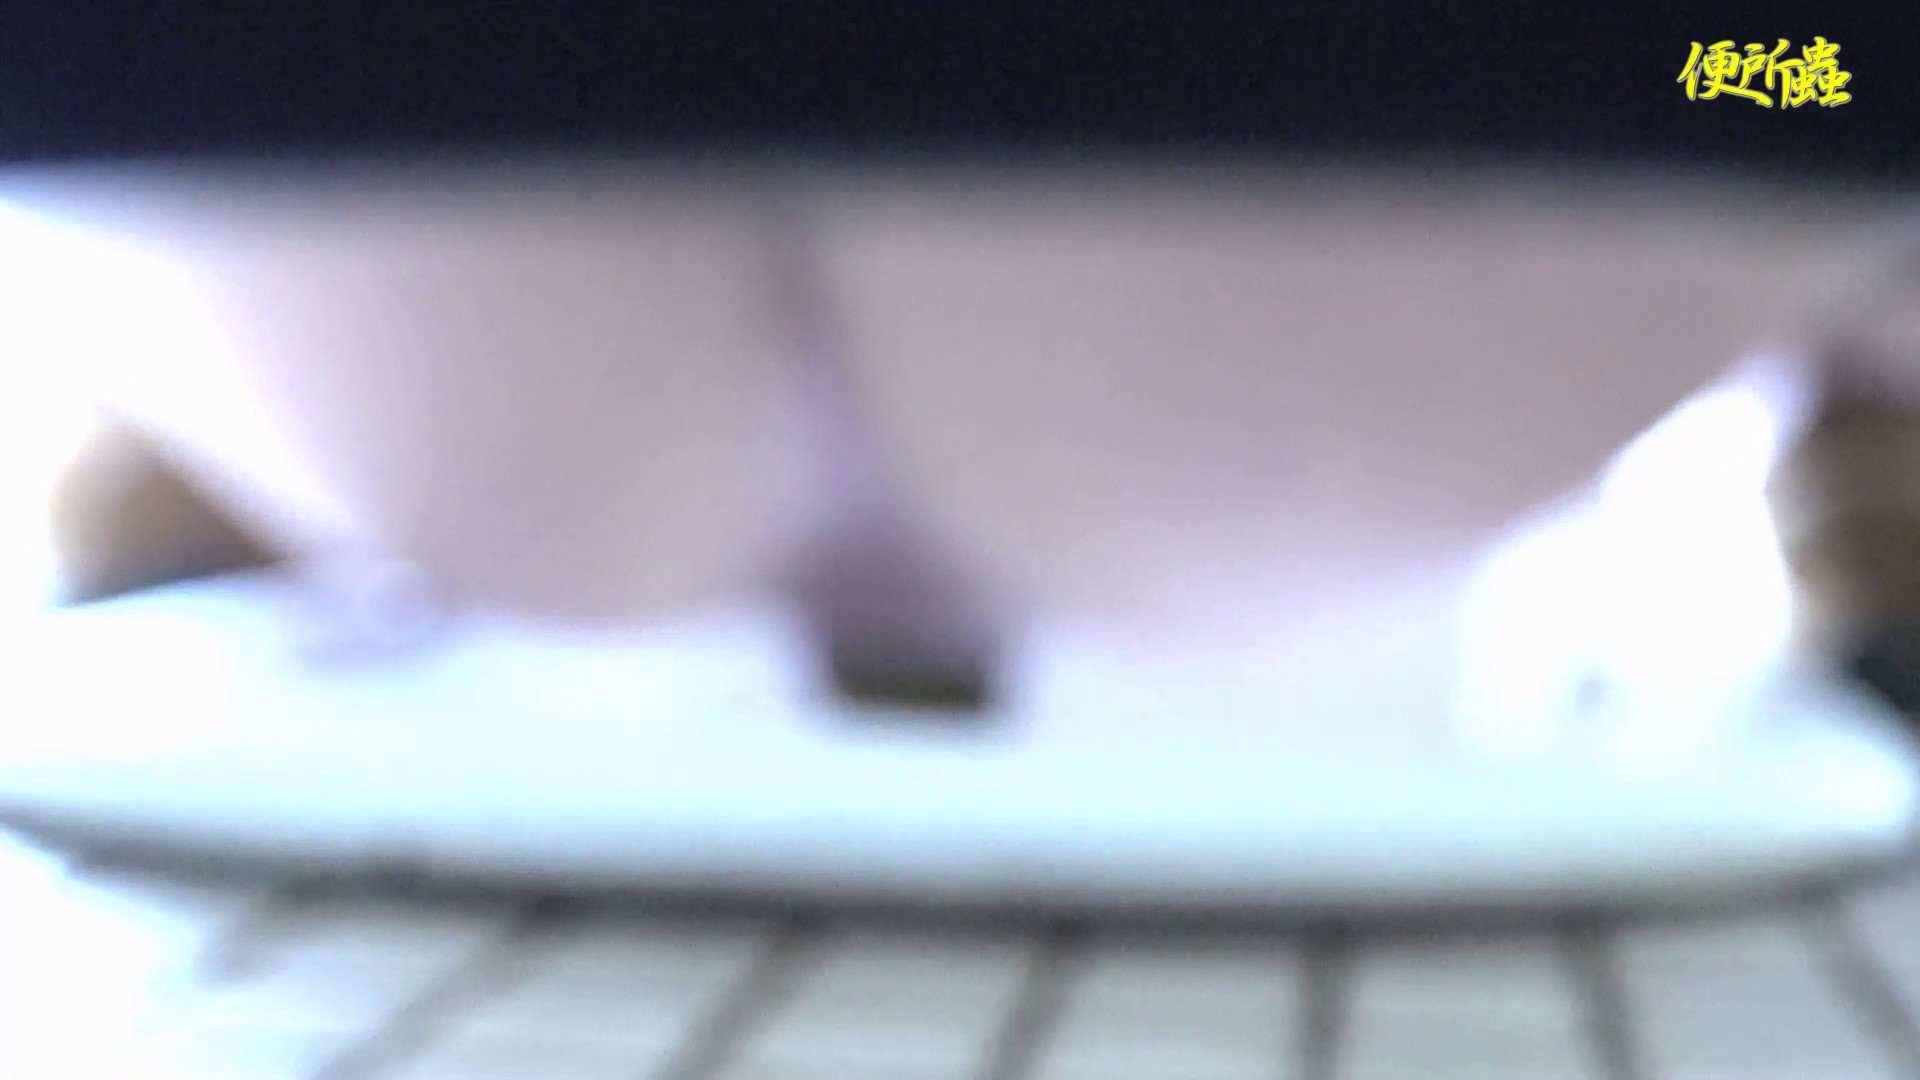 vol.01 便所蟲さんのリターン~便所蟲2匹目~ ギャルの実態 盗撮アダルト動画キャプチャ 79pic 54